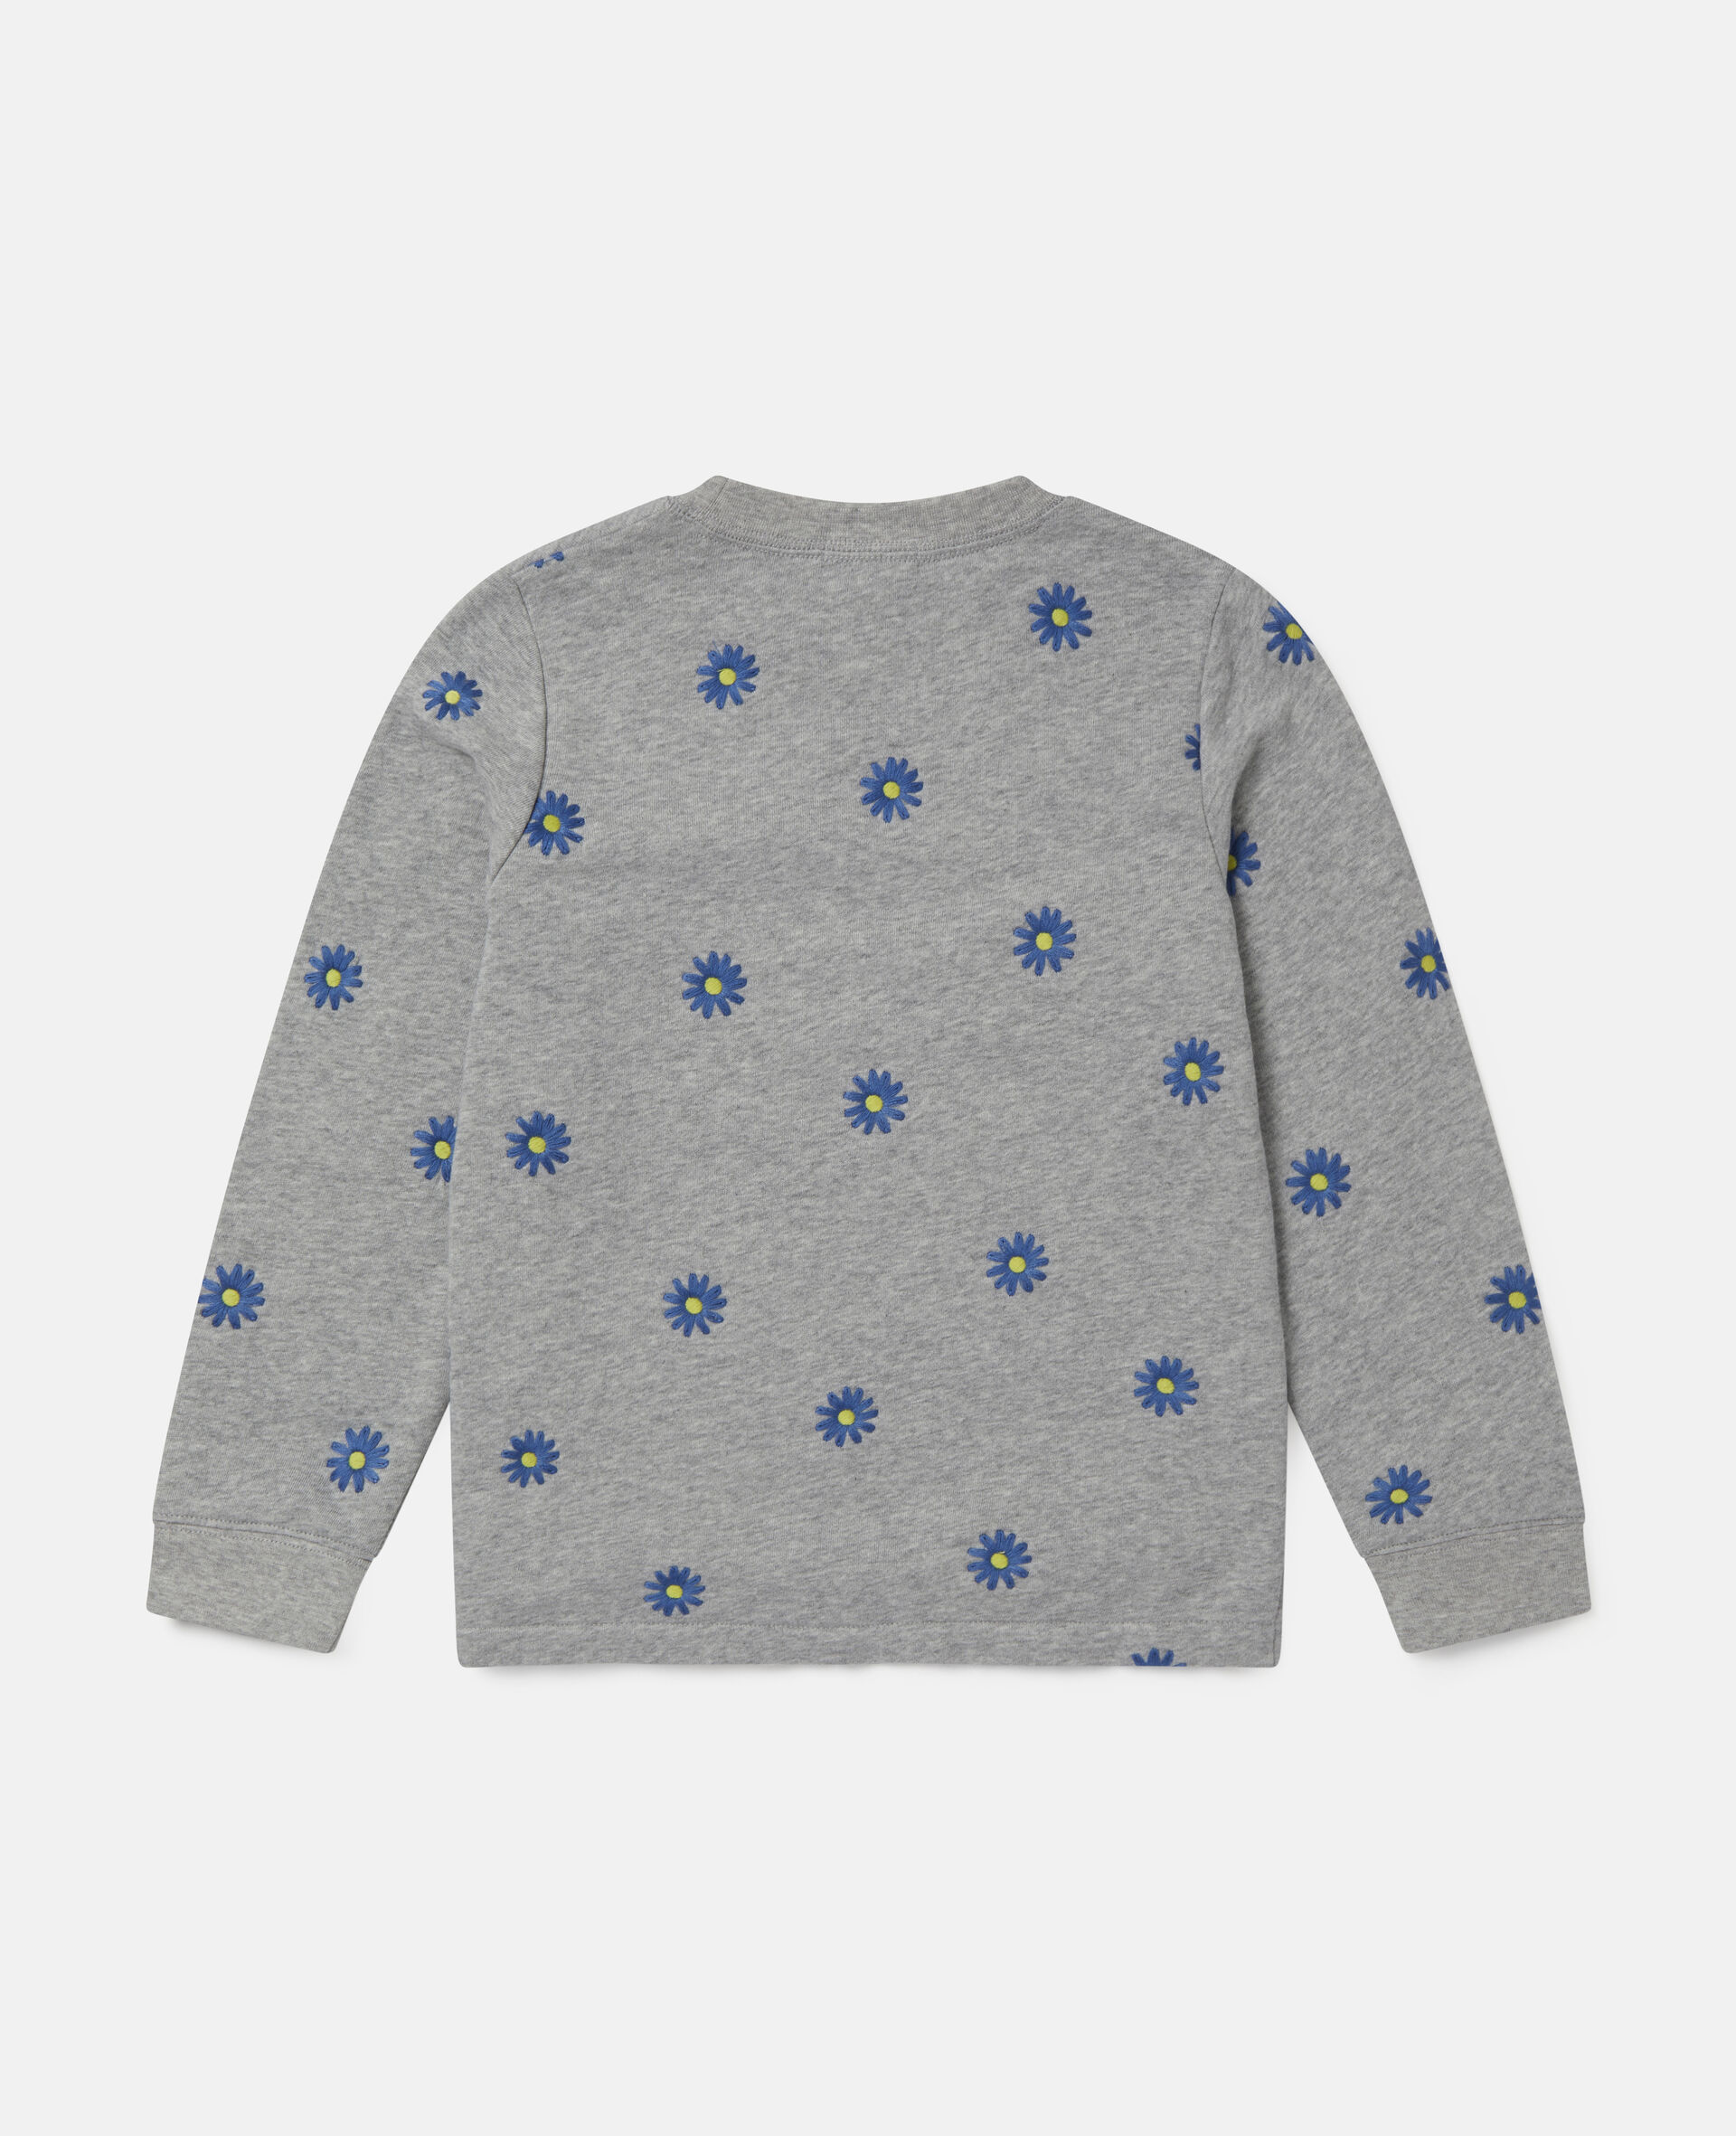 Embroidered Daisies Cotton Fleece Sweatshirt -Grey-large image number 3